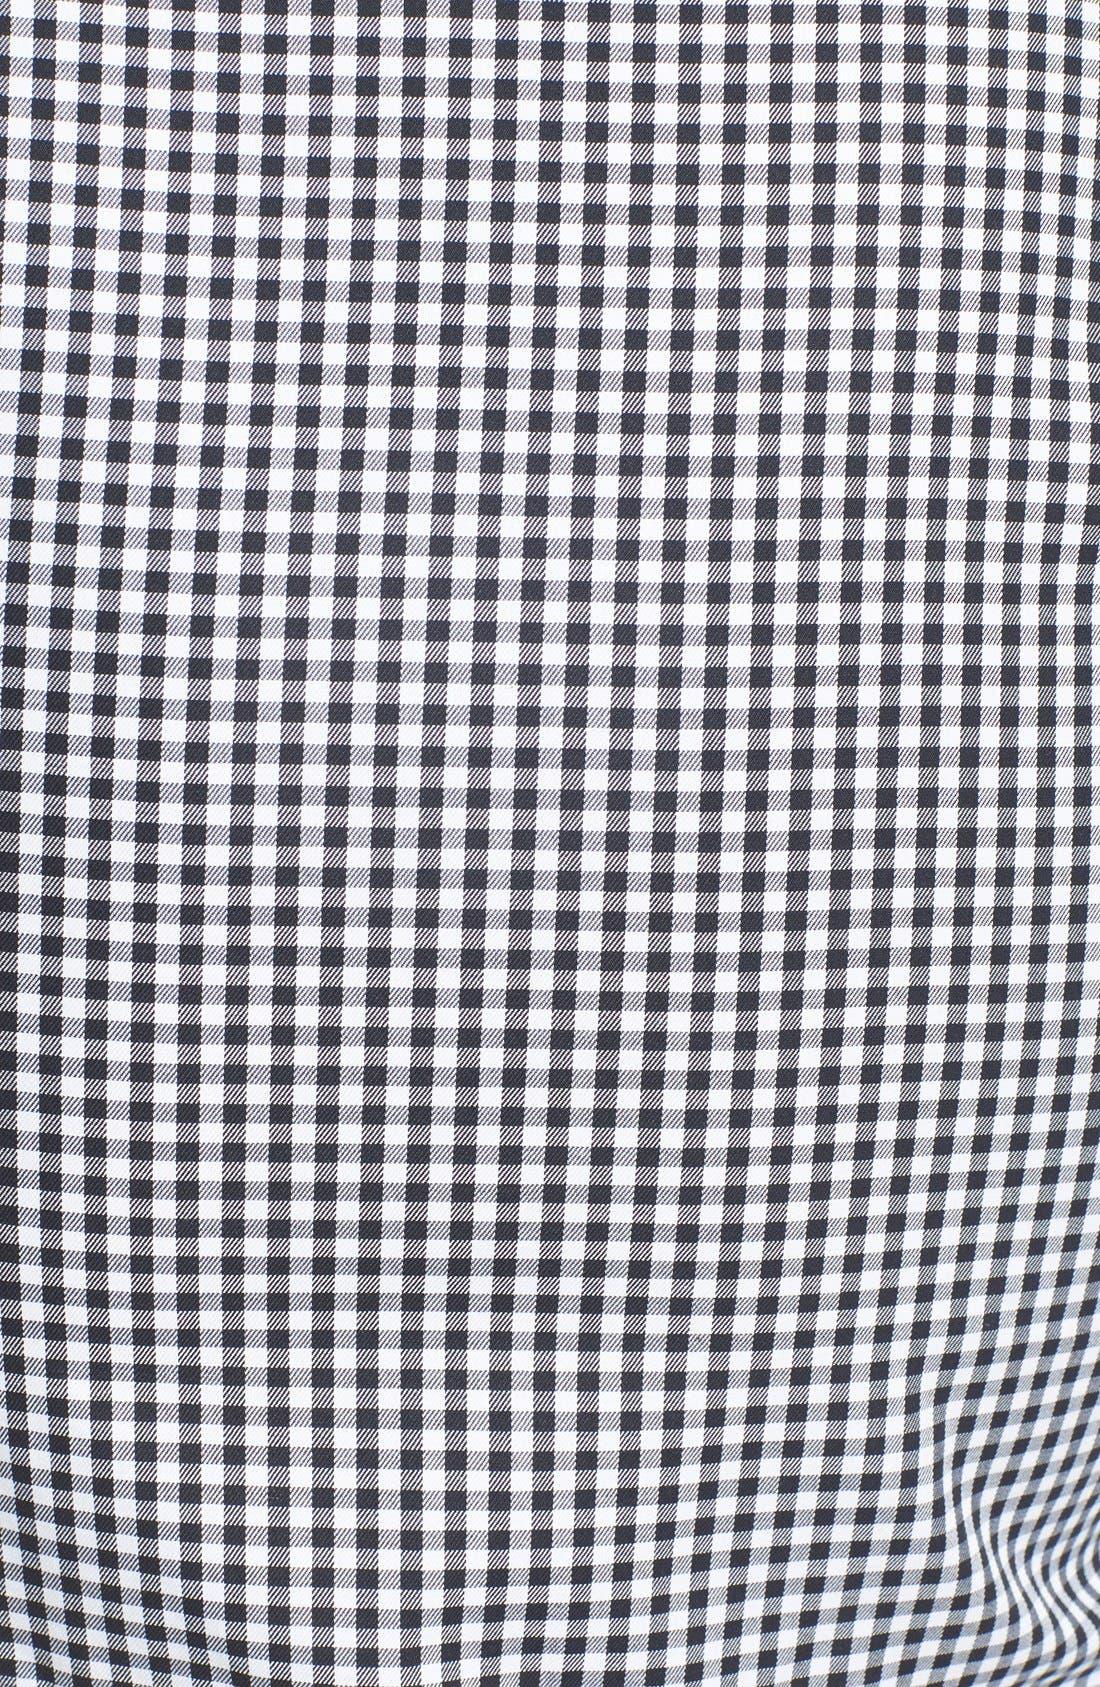 Trim Fit Non-Iron Gingham Dress Shirt,                             Alternate thumbnail 6, color,                             BLACK ROCK